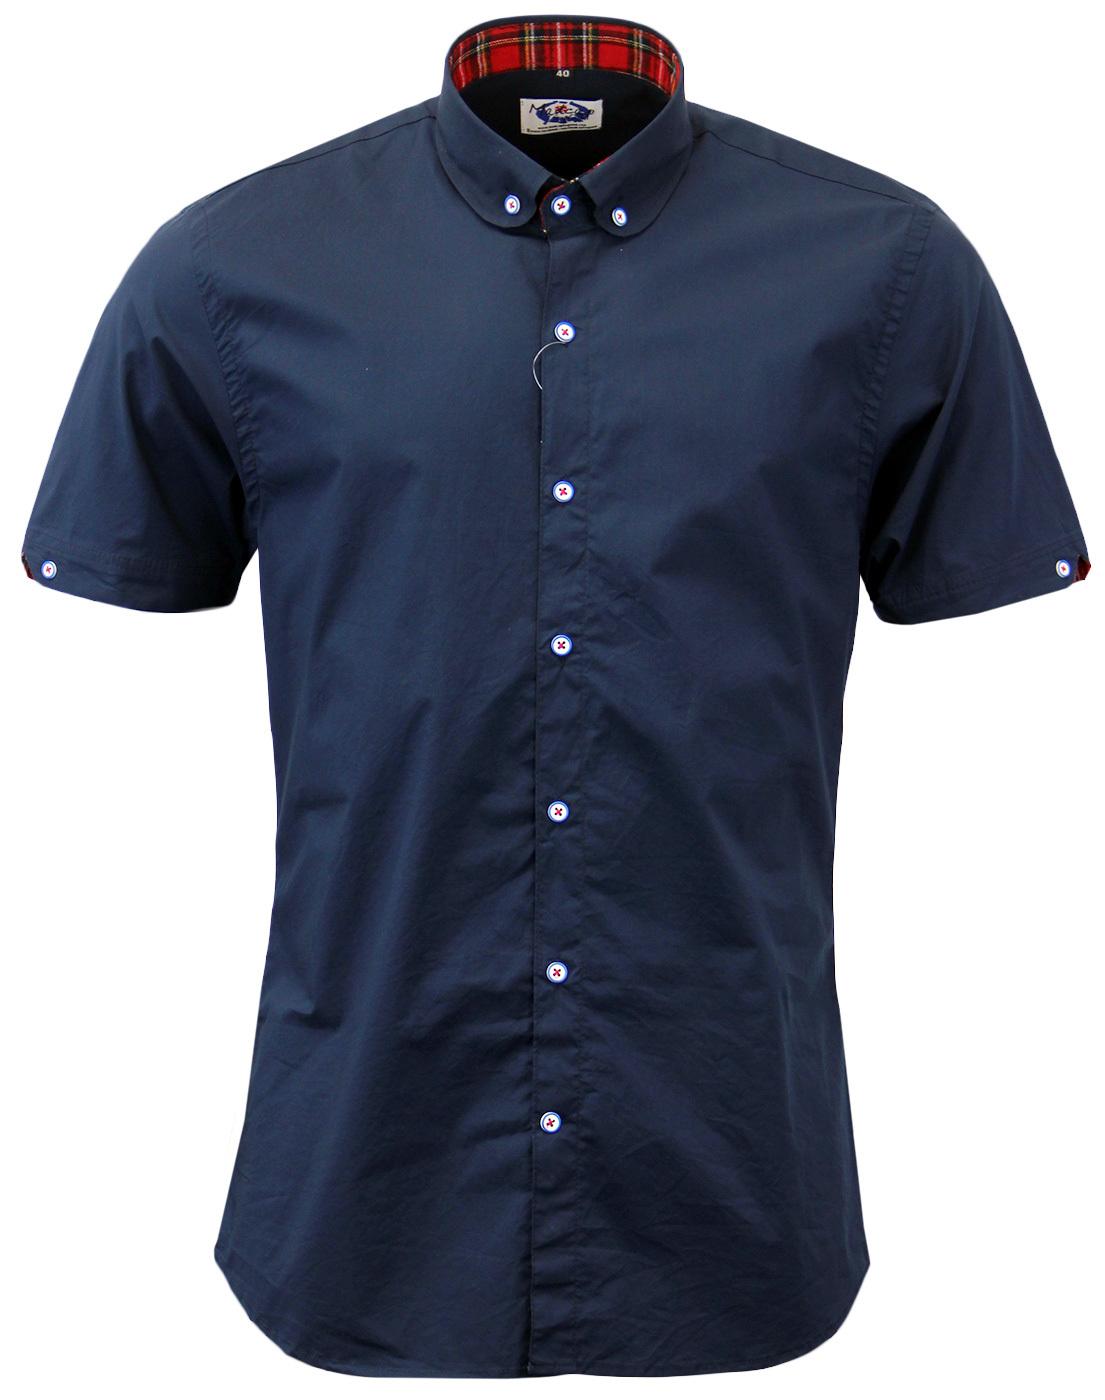 Roundhouse MADCAP ENGLAND Mod Penny Collar Shirt N